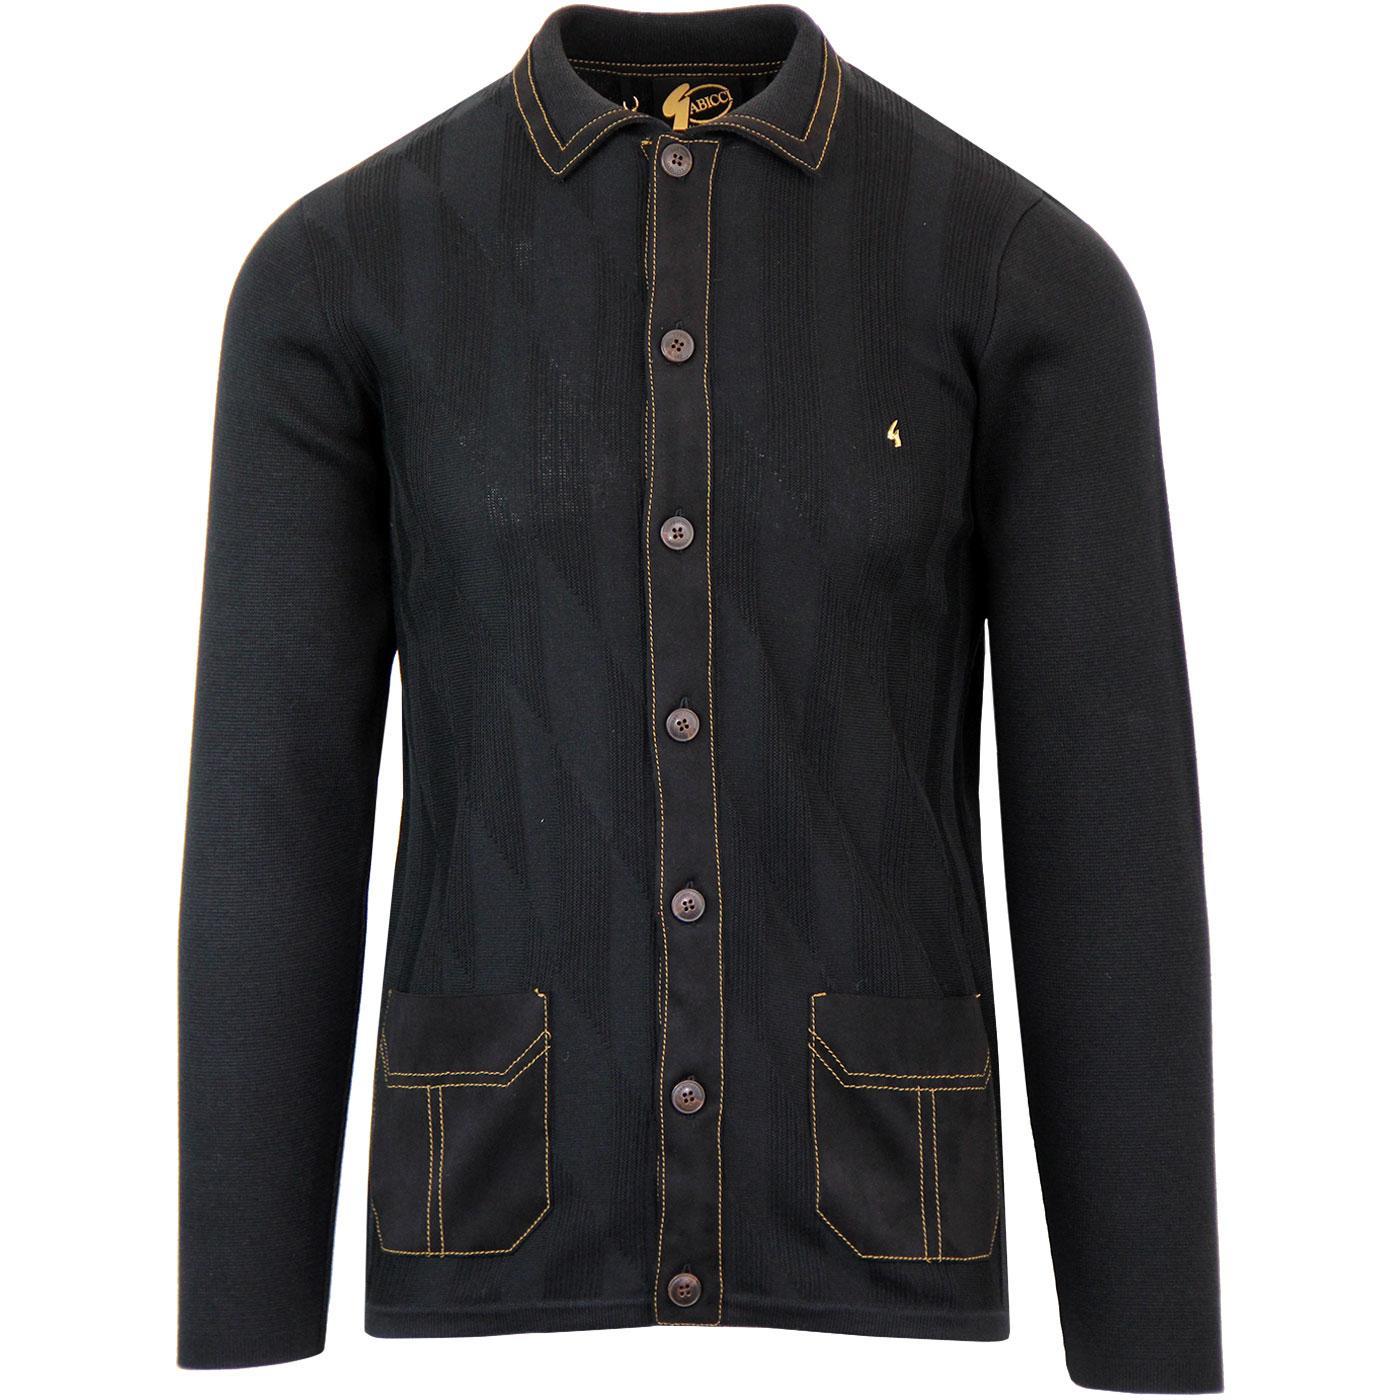 Evan GABICCI VINTAGE Ltd Edition Mod Polo Cardigan